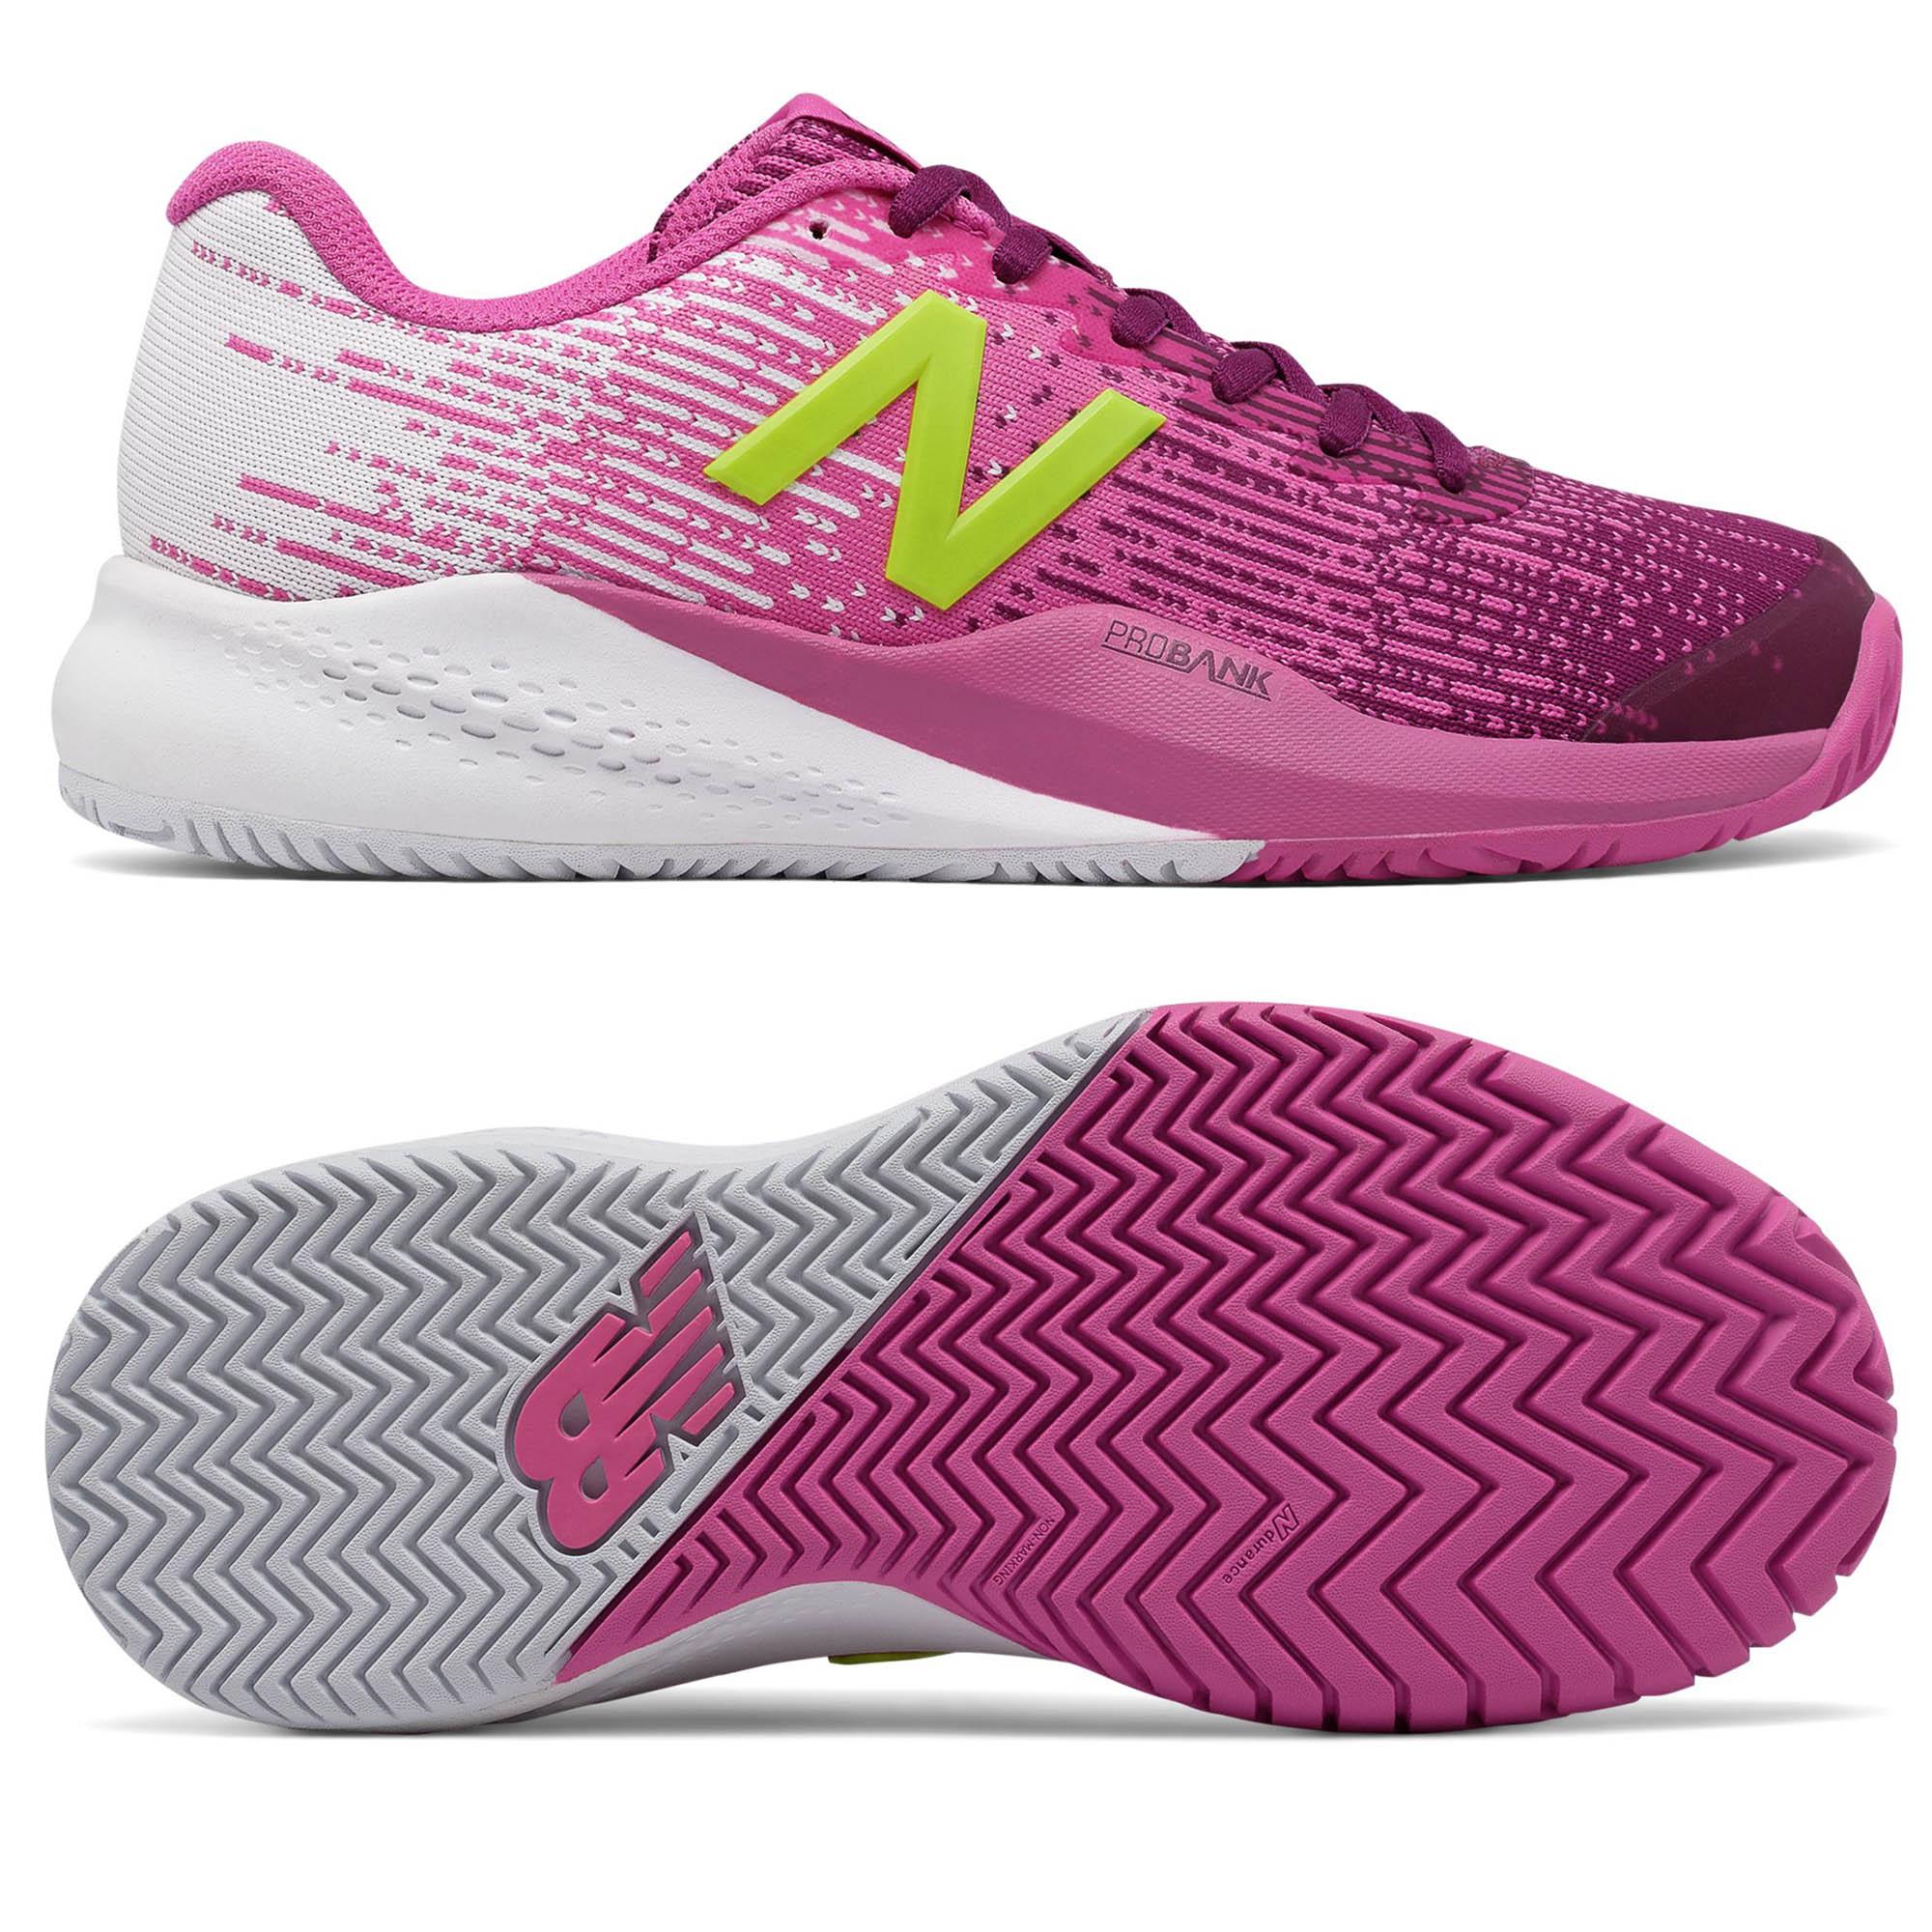 New Balance WC996 v3 Ladies Tennis Shoes  PinkWhite 6.5 UK